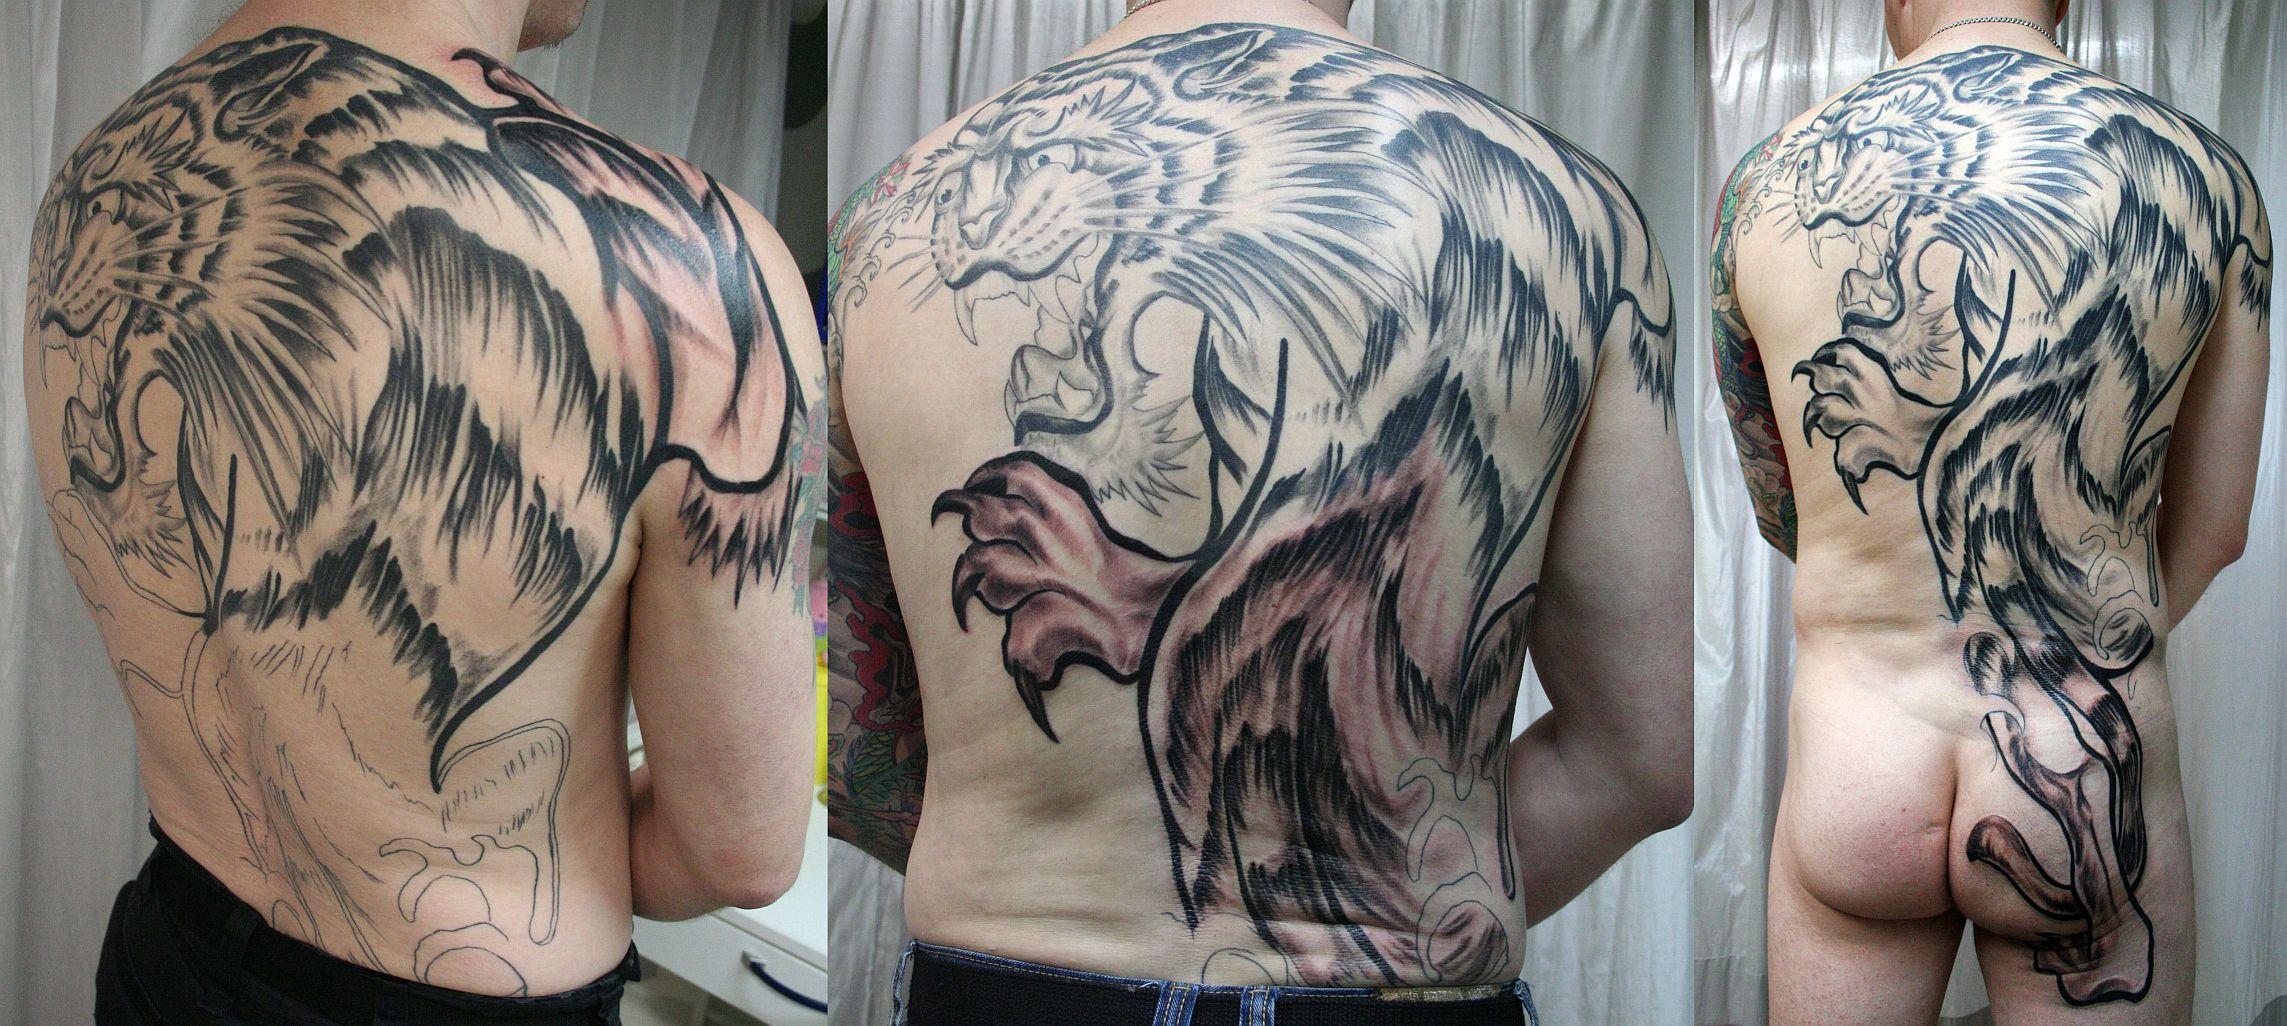 Best Traditional Samurai Tattoo Designs Their Meaning For Men - Best traditional samurai tattoo designs meaning men women